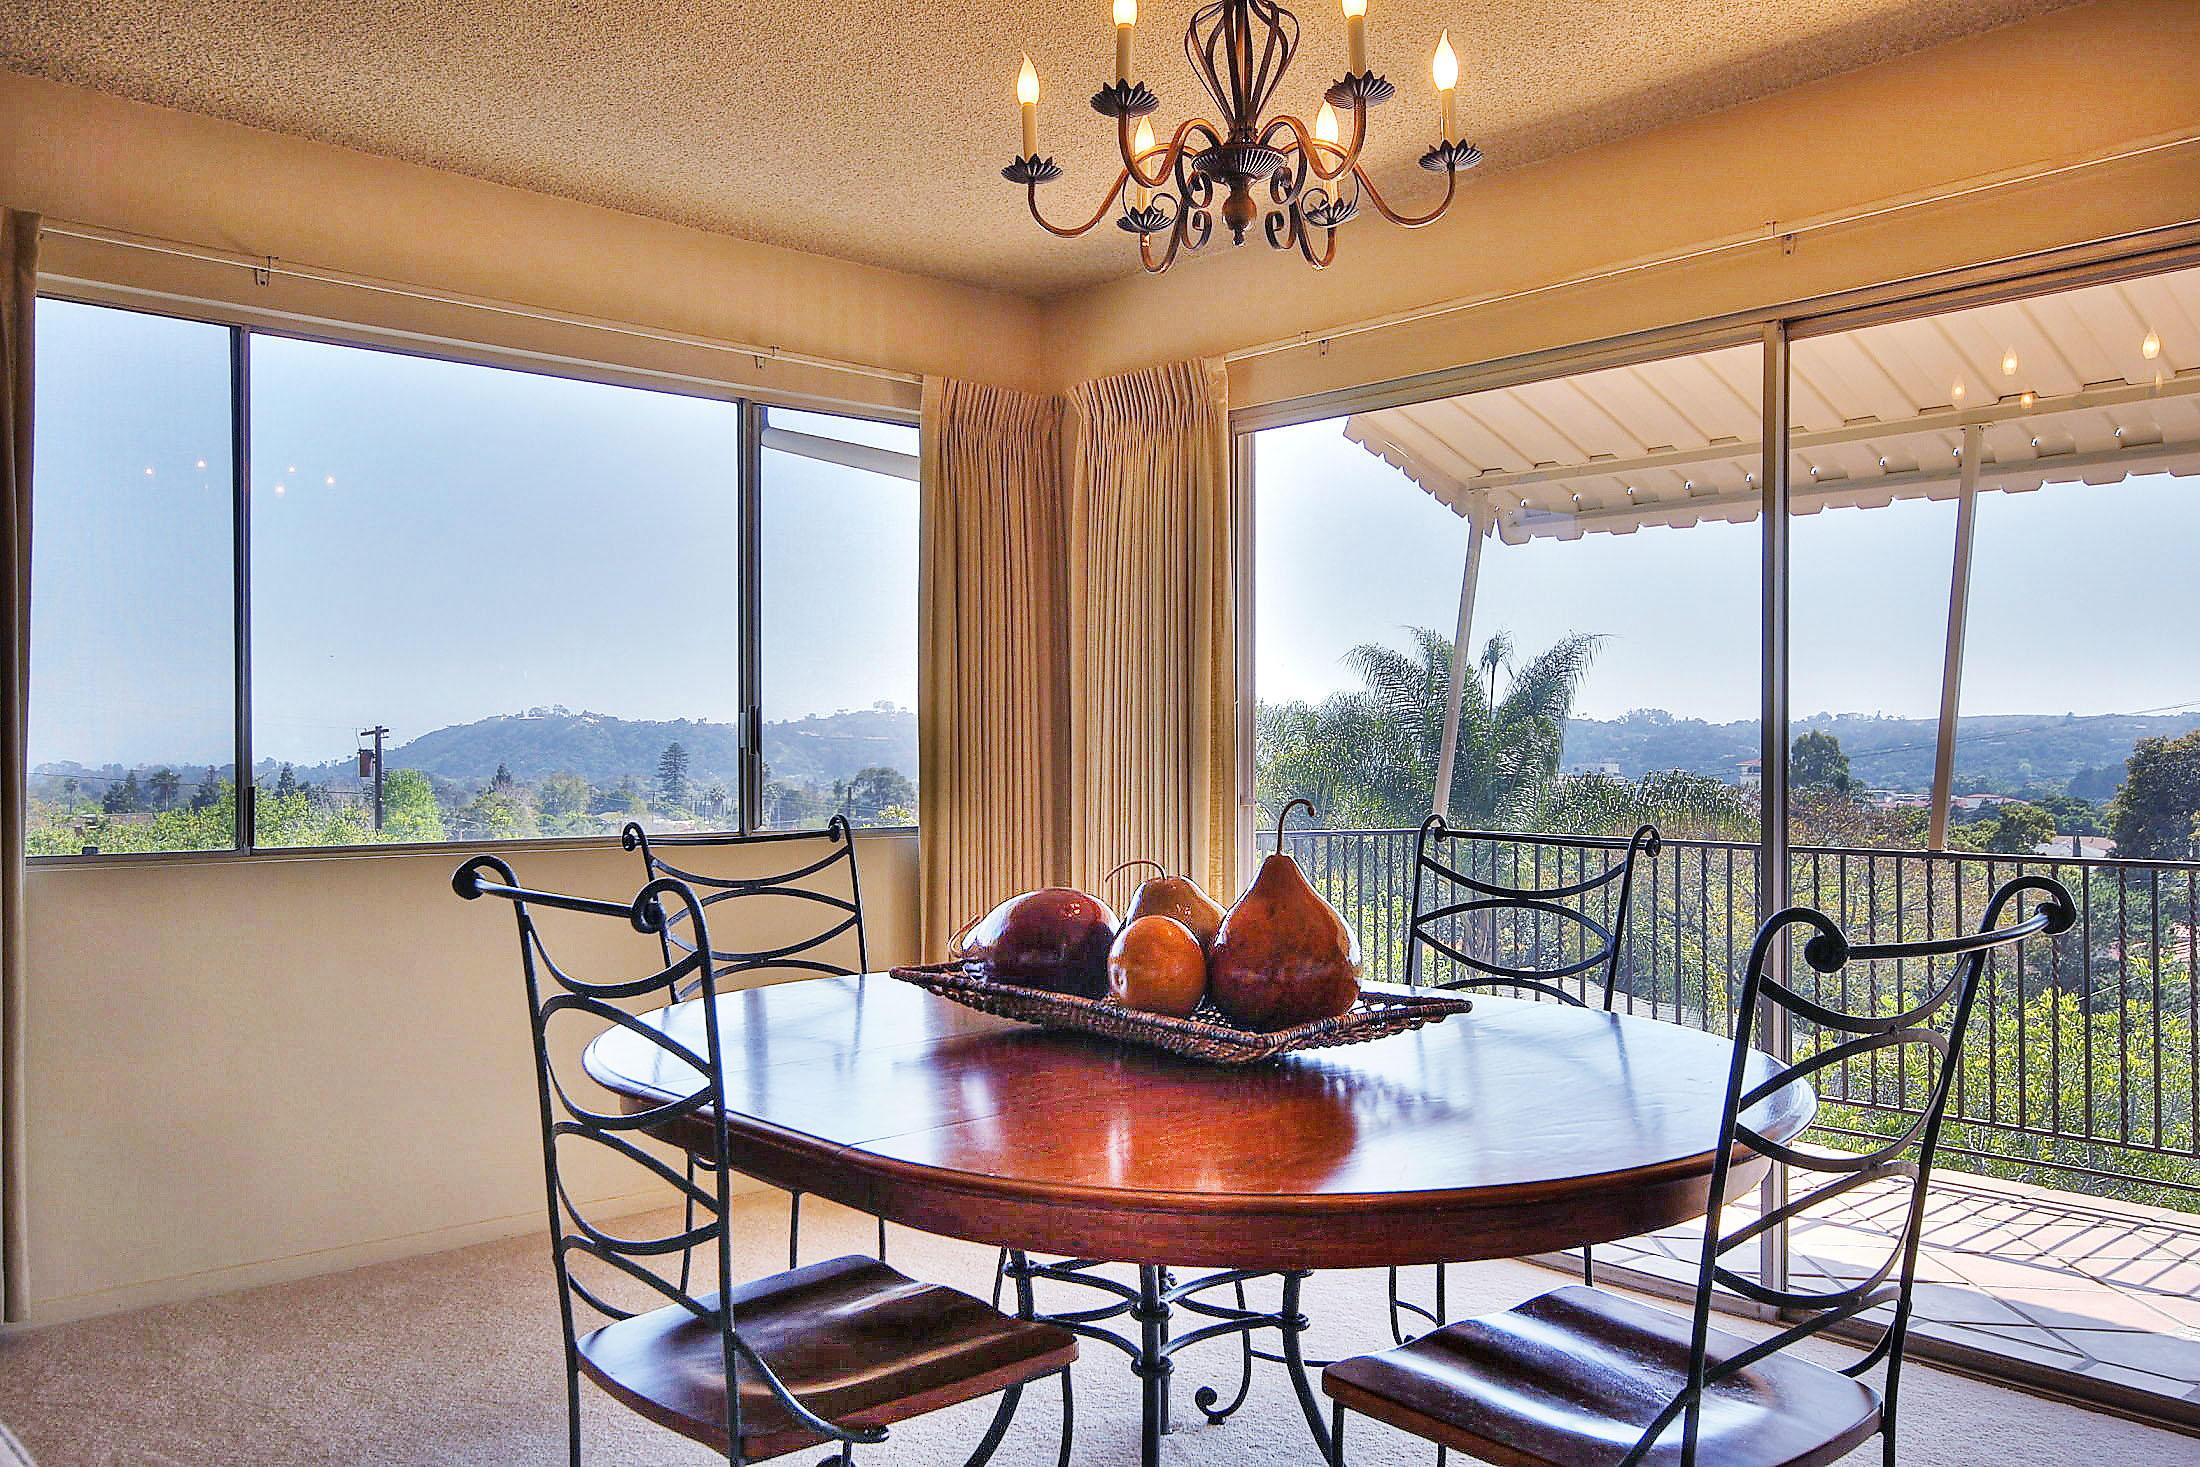 Property photo for 2525 State St #33 Santa Barbara, California 93105 - 15-856